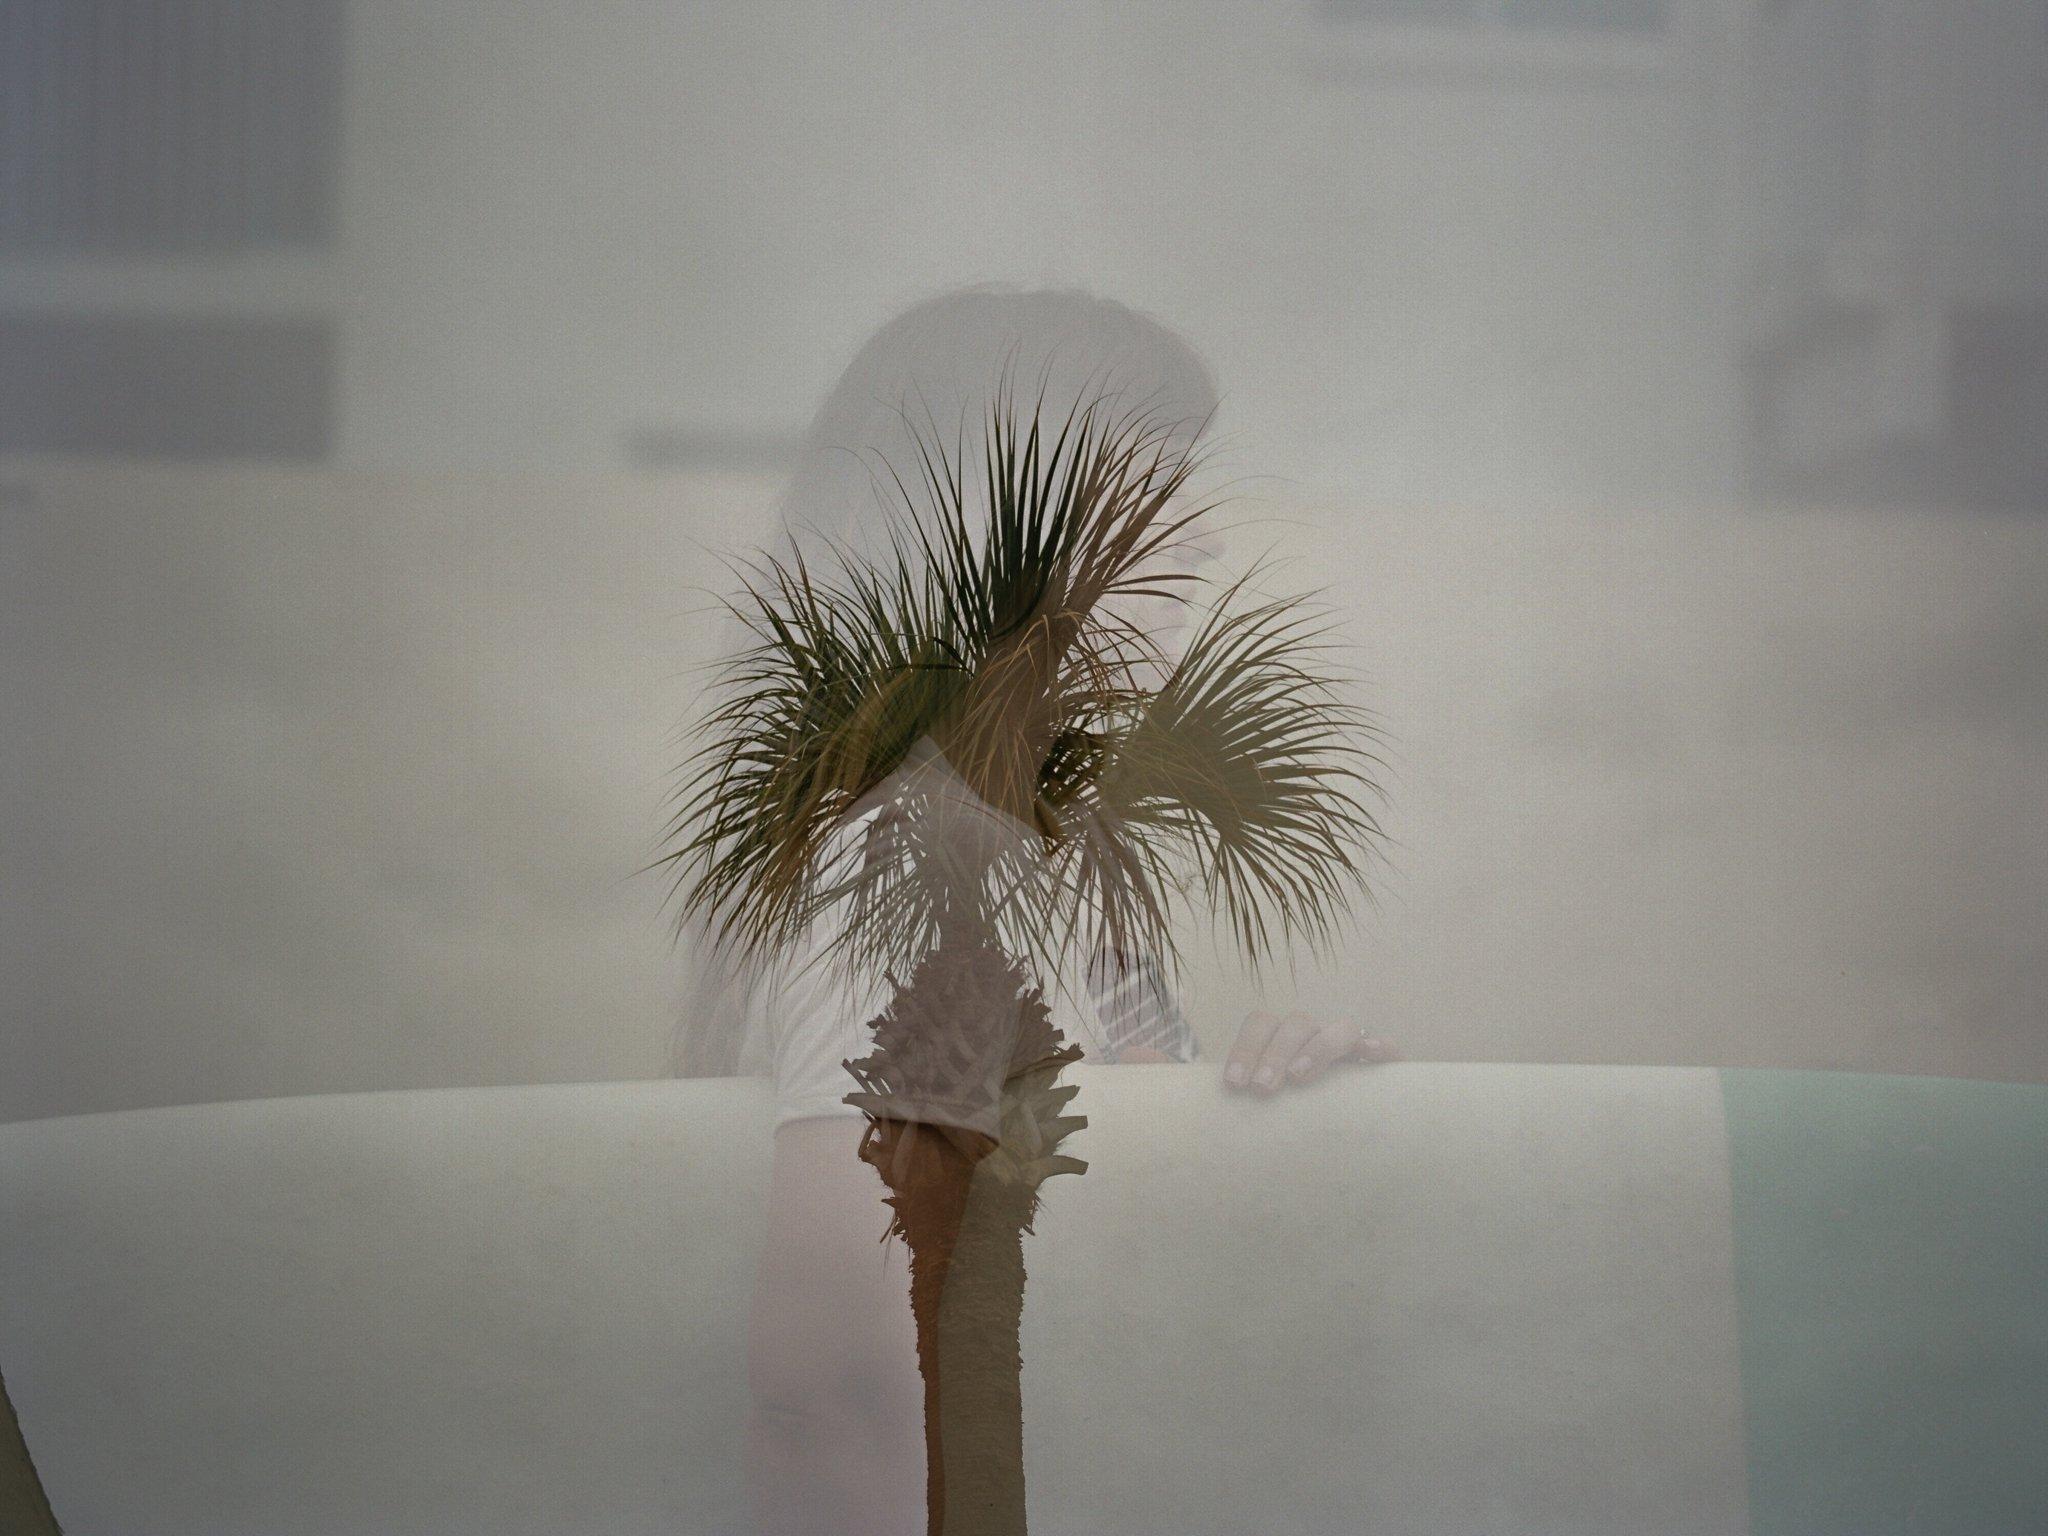 west palm beach branding photographer west palm beach headshot photographer shannon griffin photography_0007.jpg